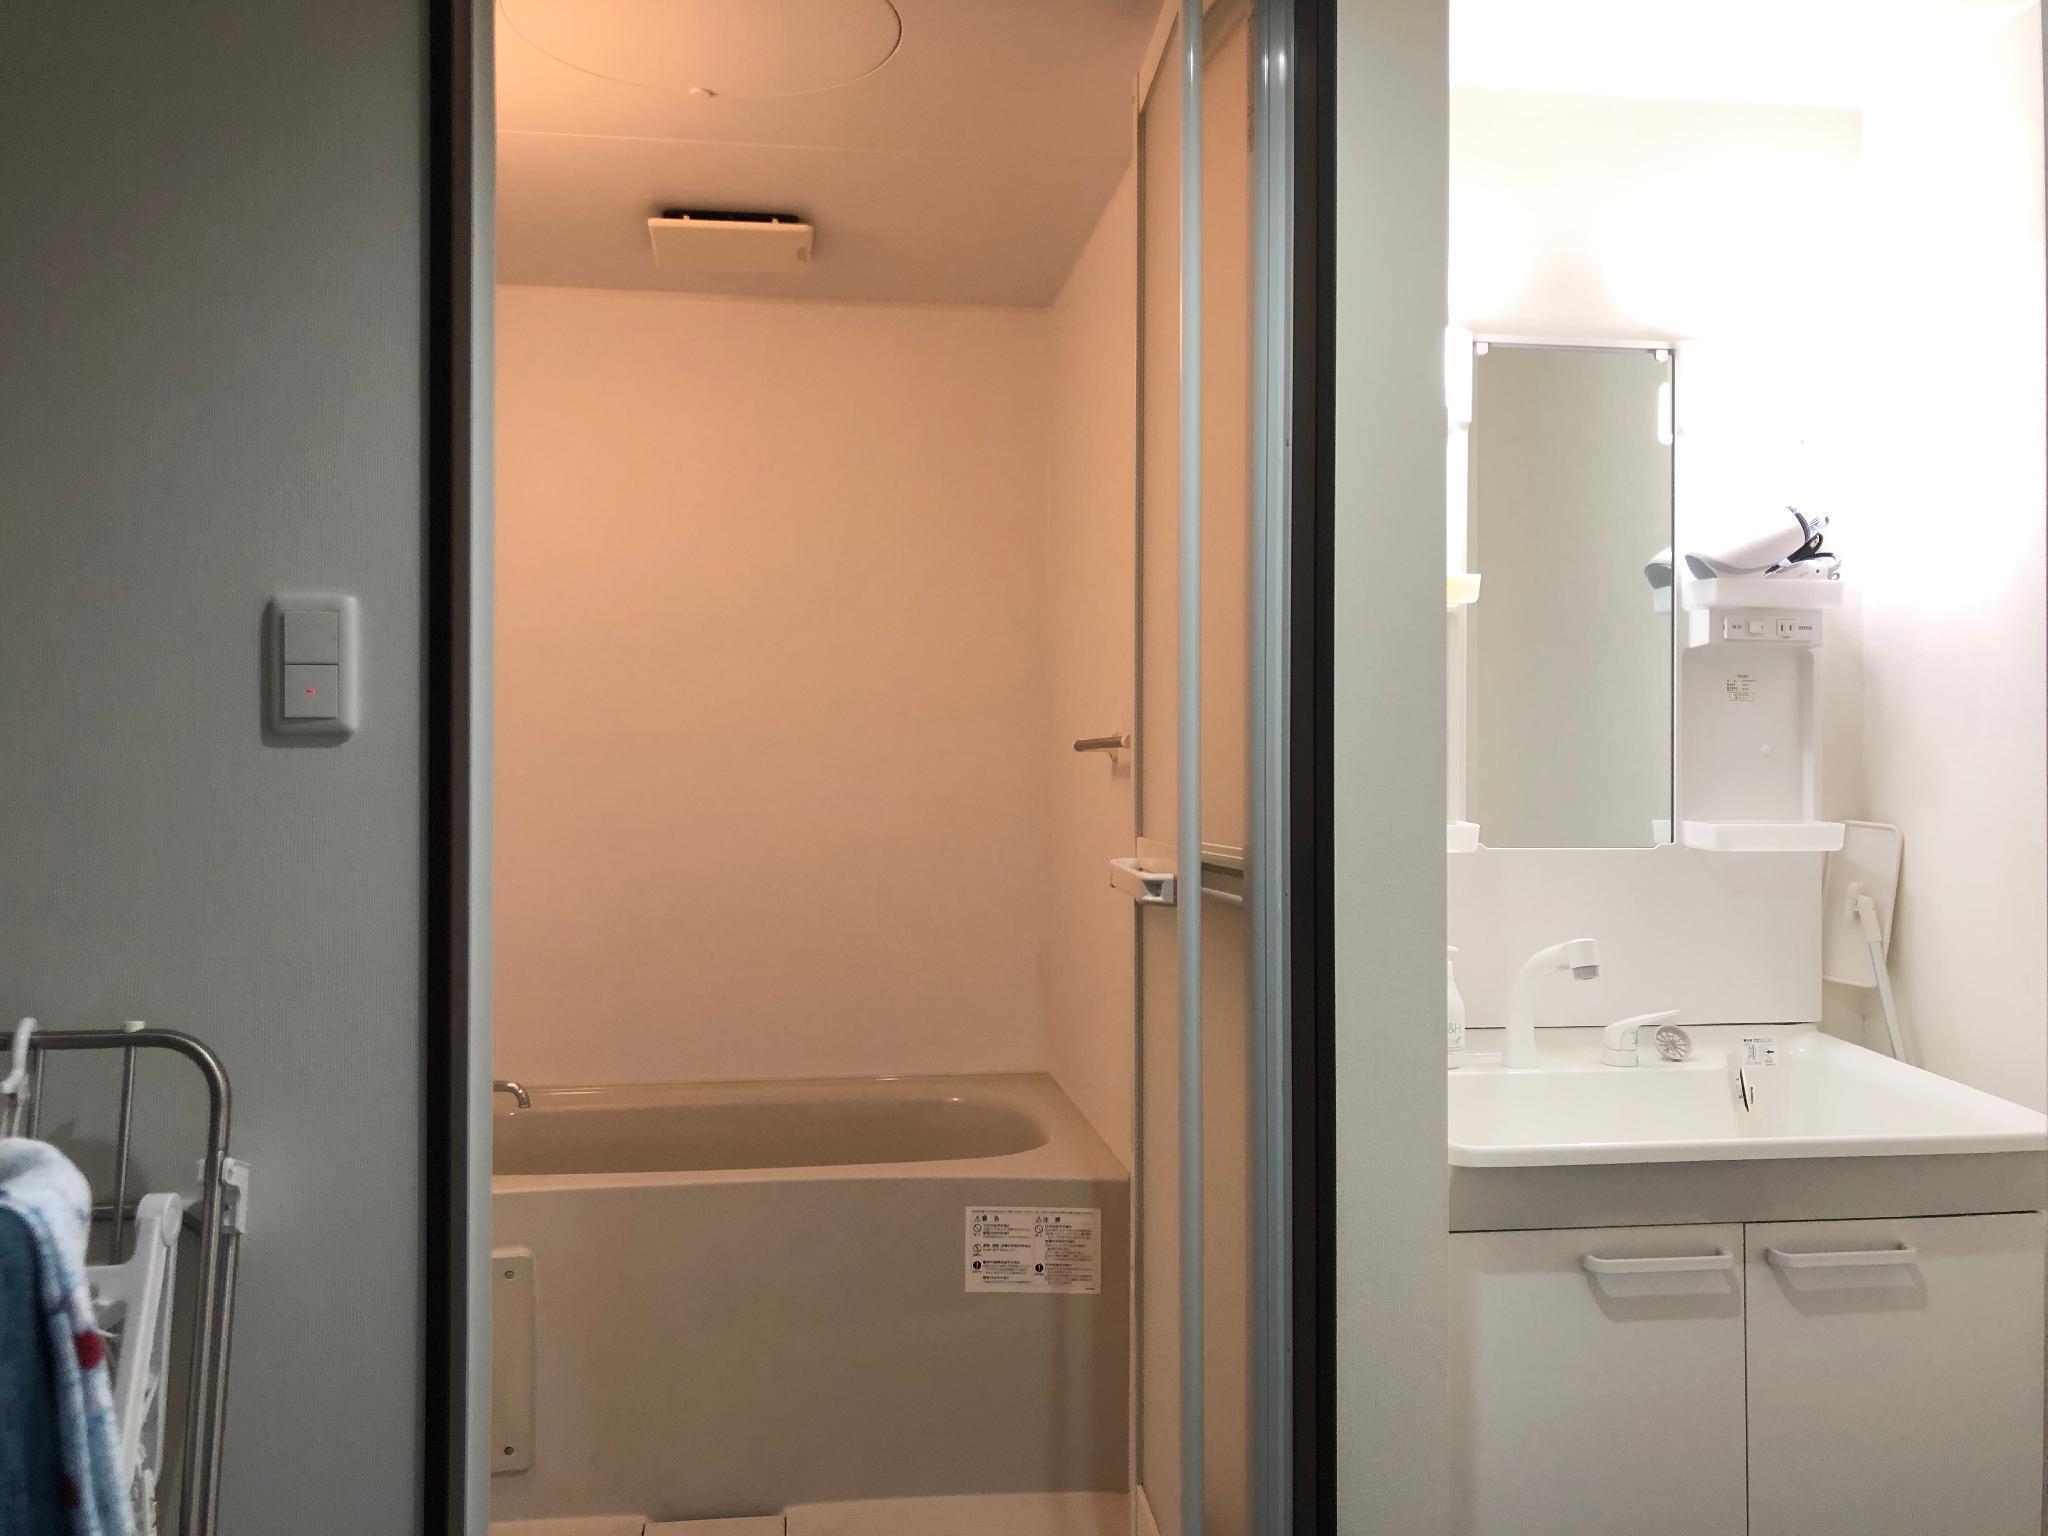 S61 13 2Bedroom Apartment In Sapporo